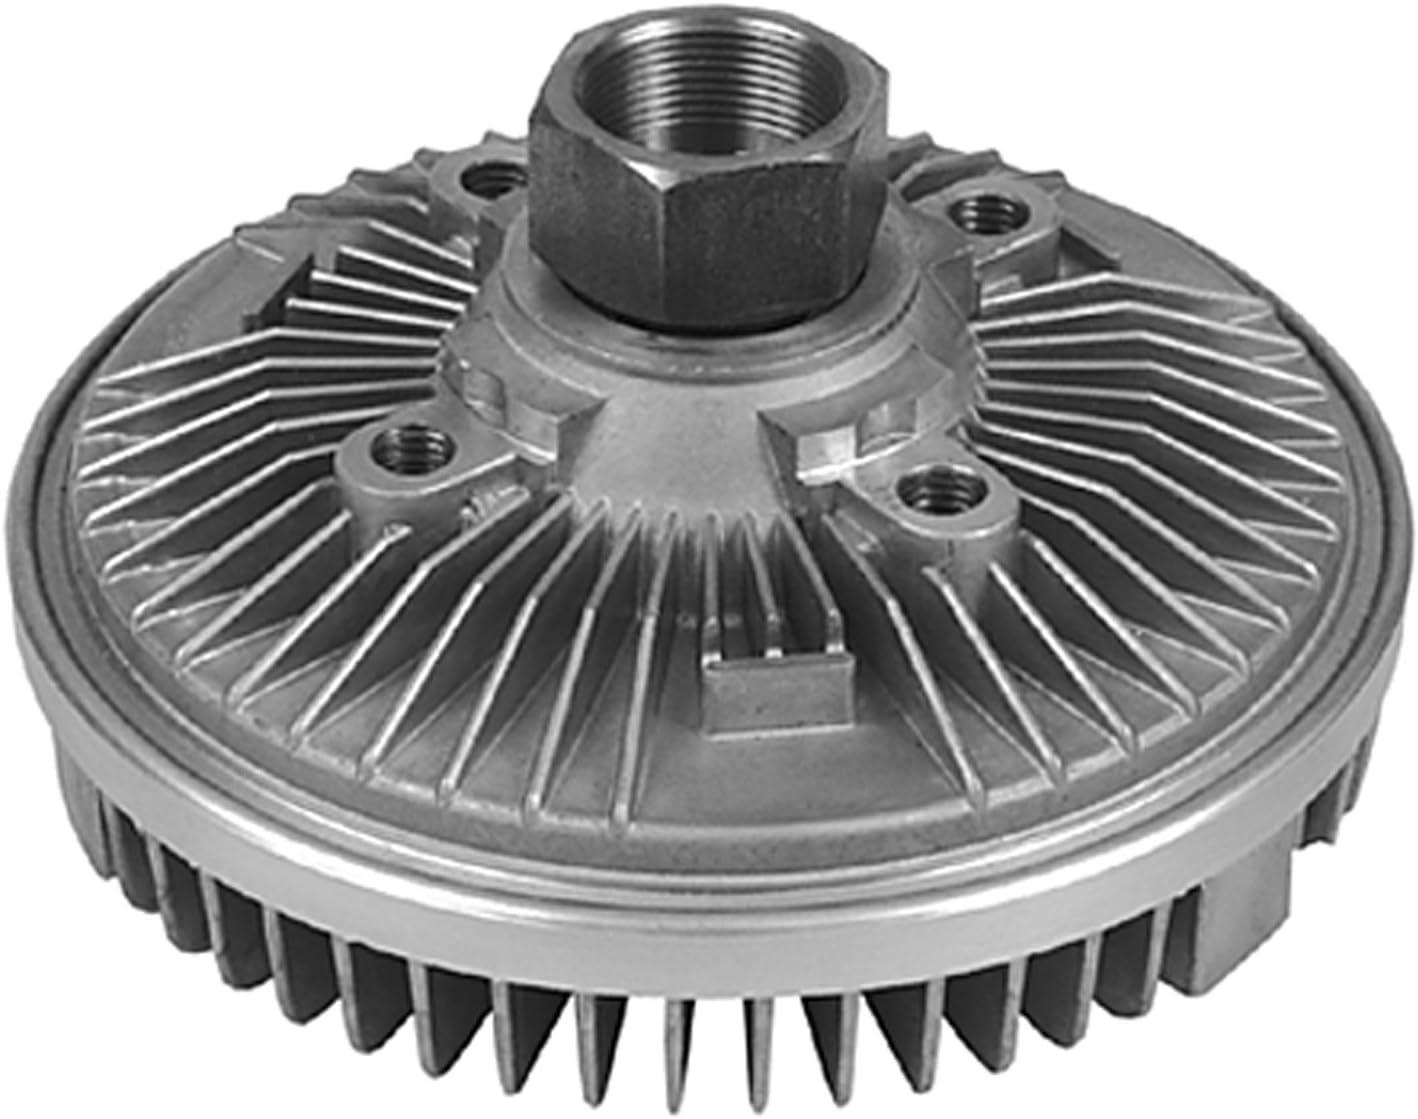 Hayden Automotive 2787 Premium Fan Clutch